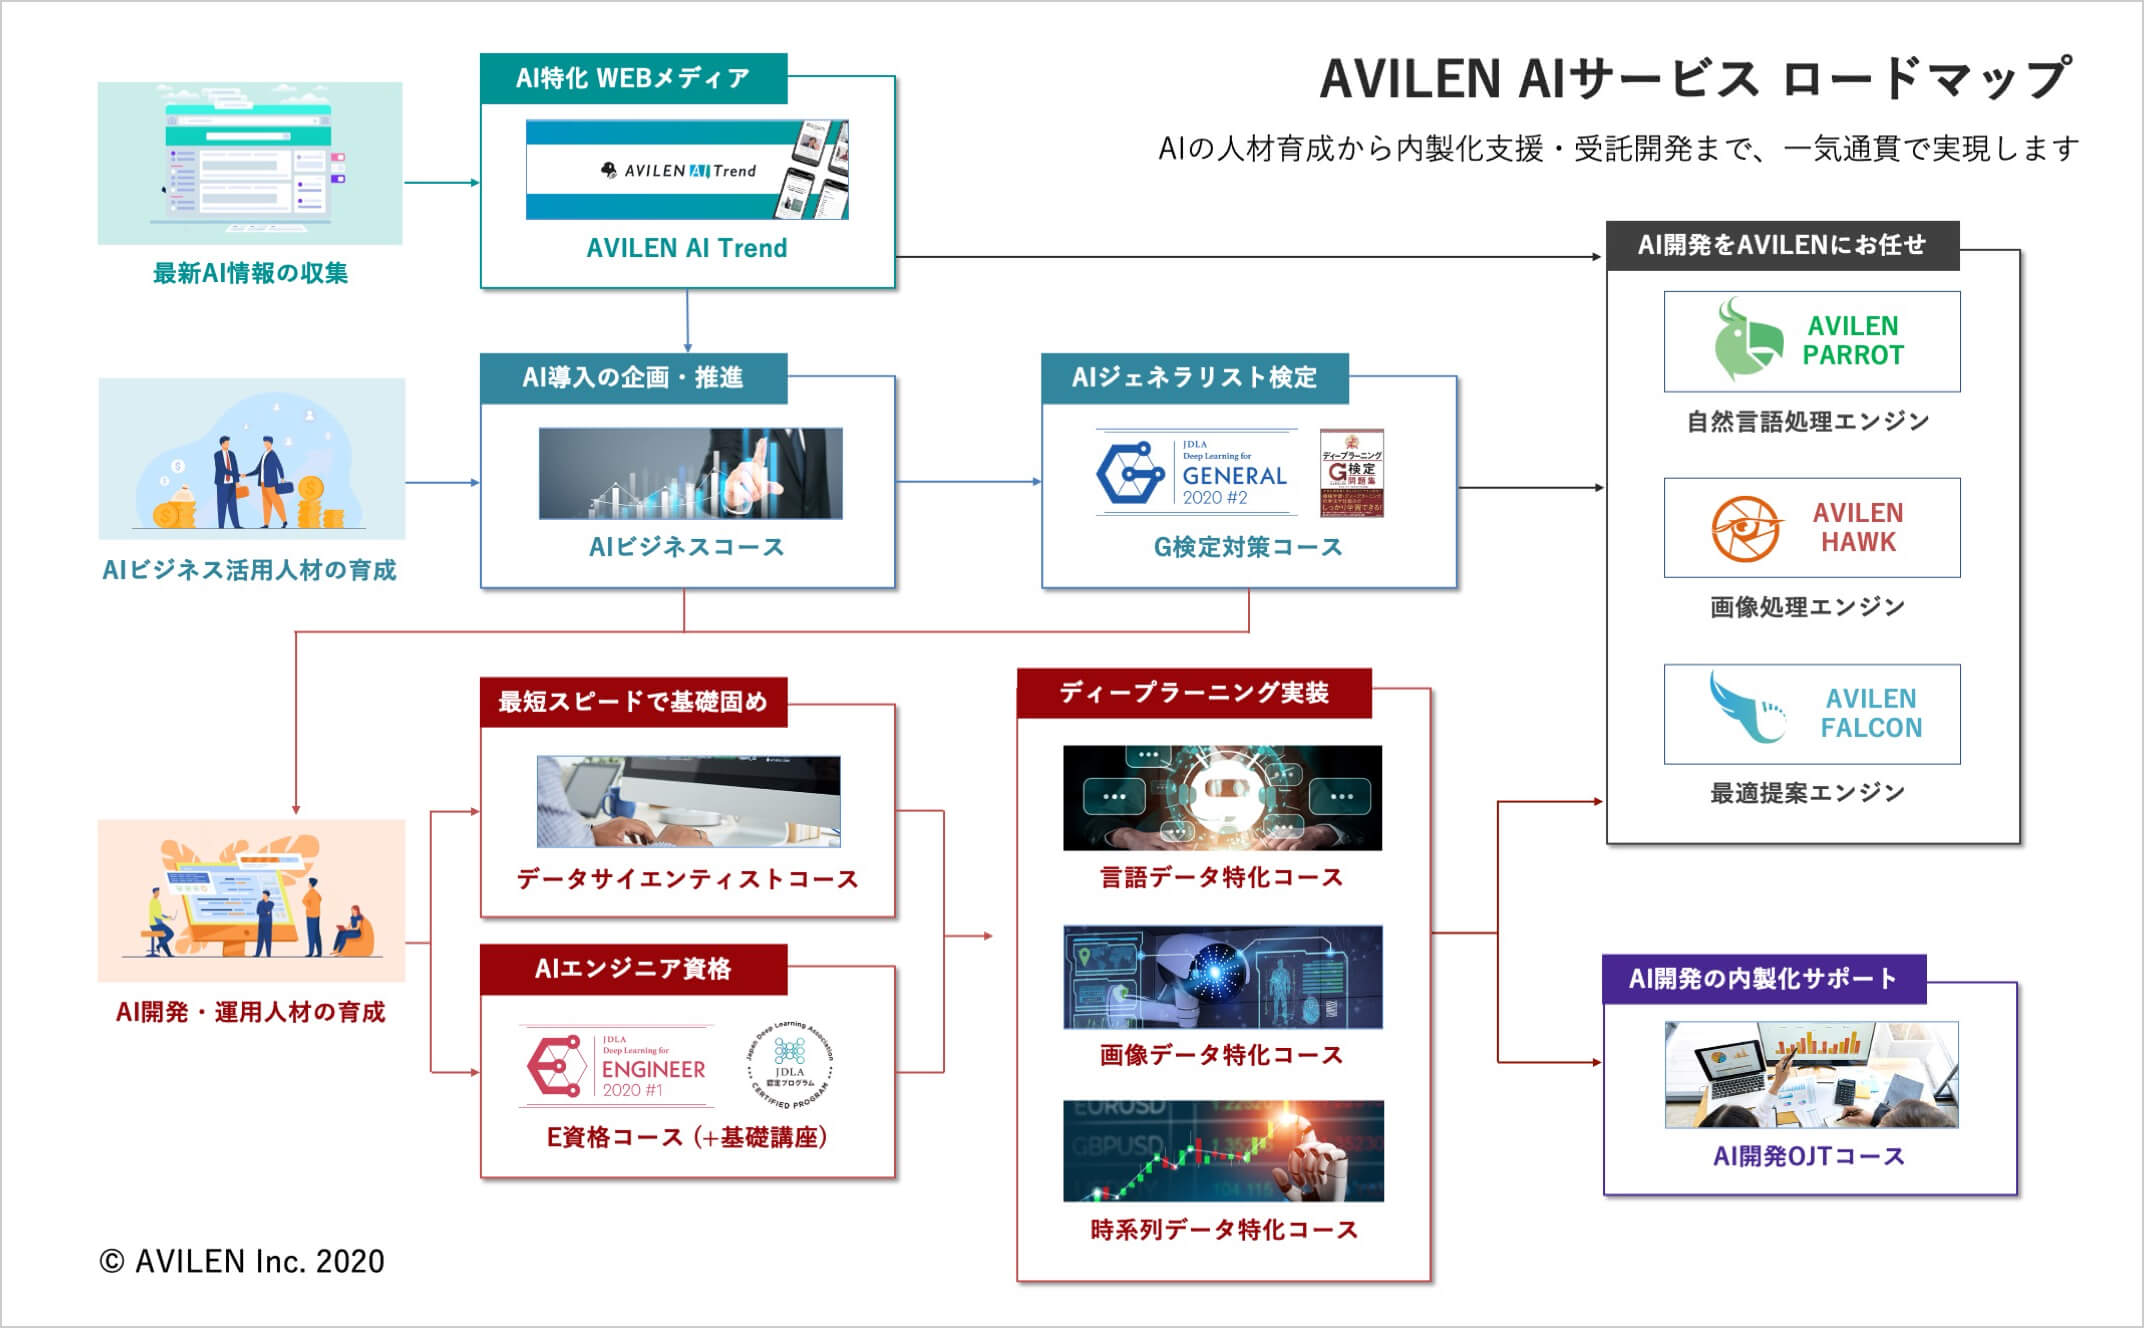 AVILEN AIサービスマップ